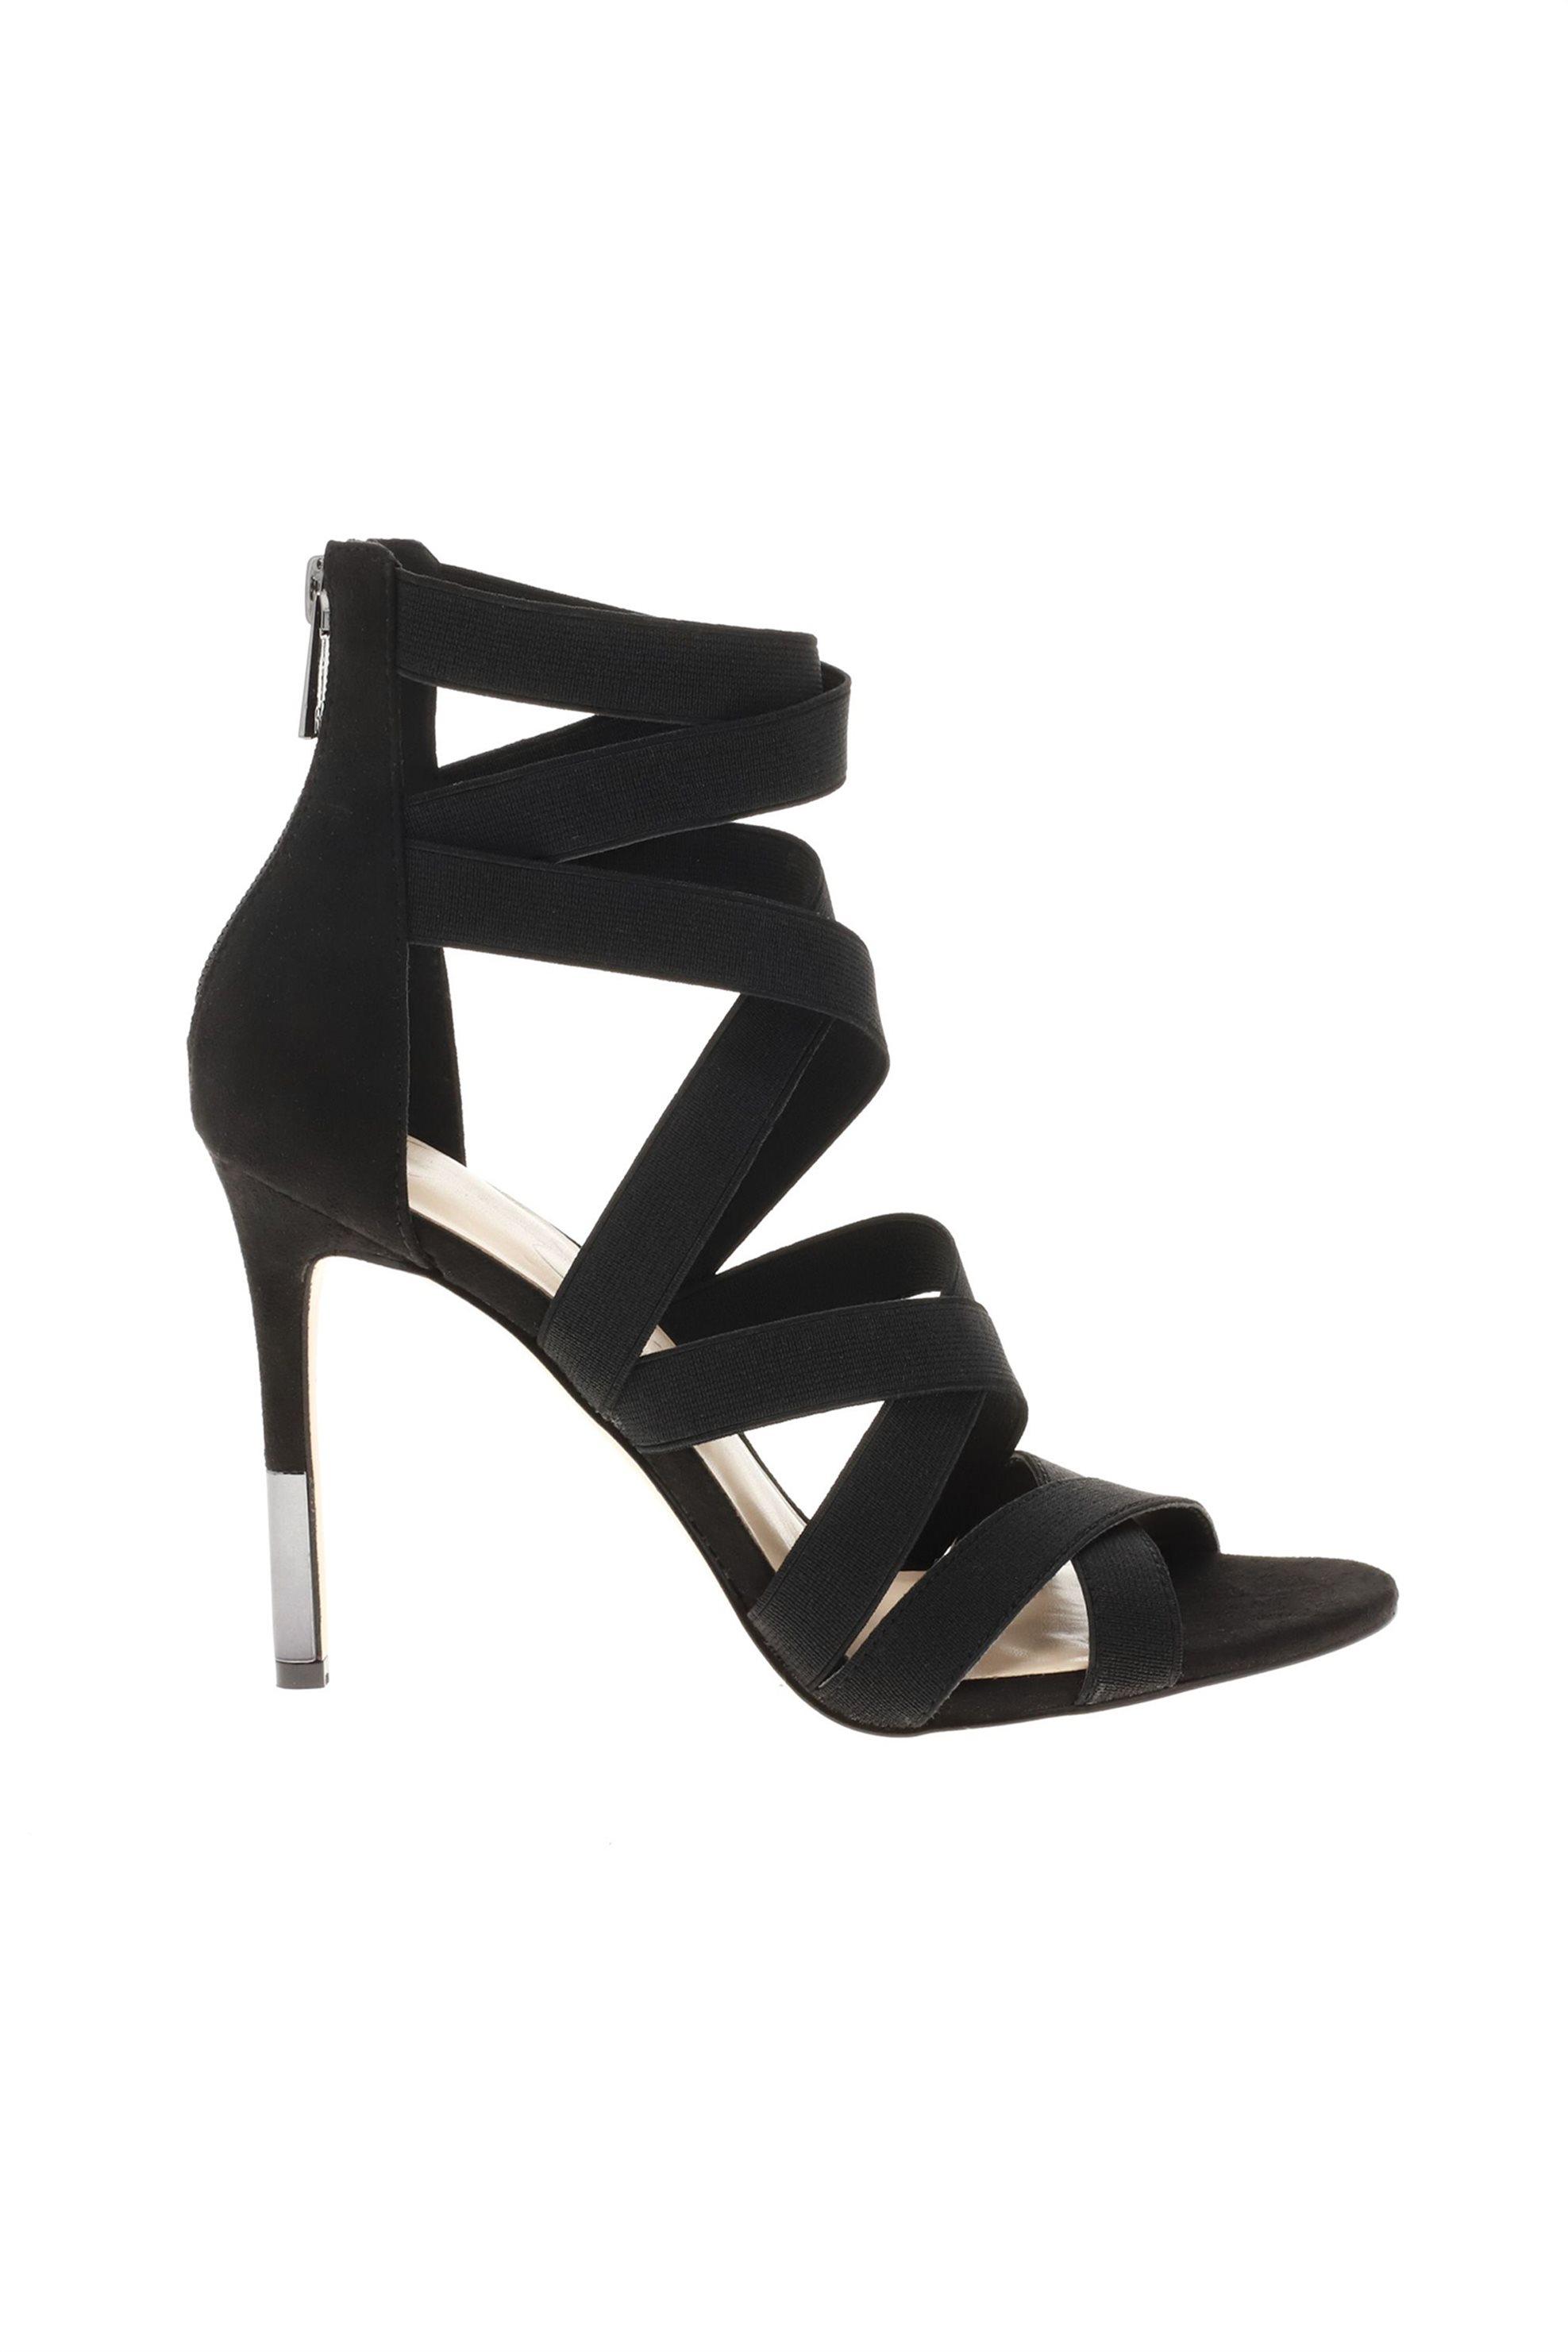 b357e033f62 Notos Jessica Simpson γυναικεία ψηλοτάκουνα πέδιλα με λουράκια από λάστιχο  – JYRA2 ELSTGR – Μαύρο